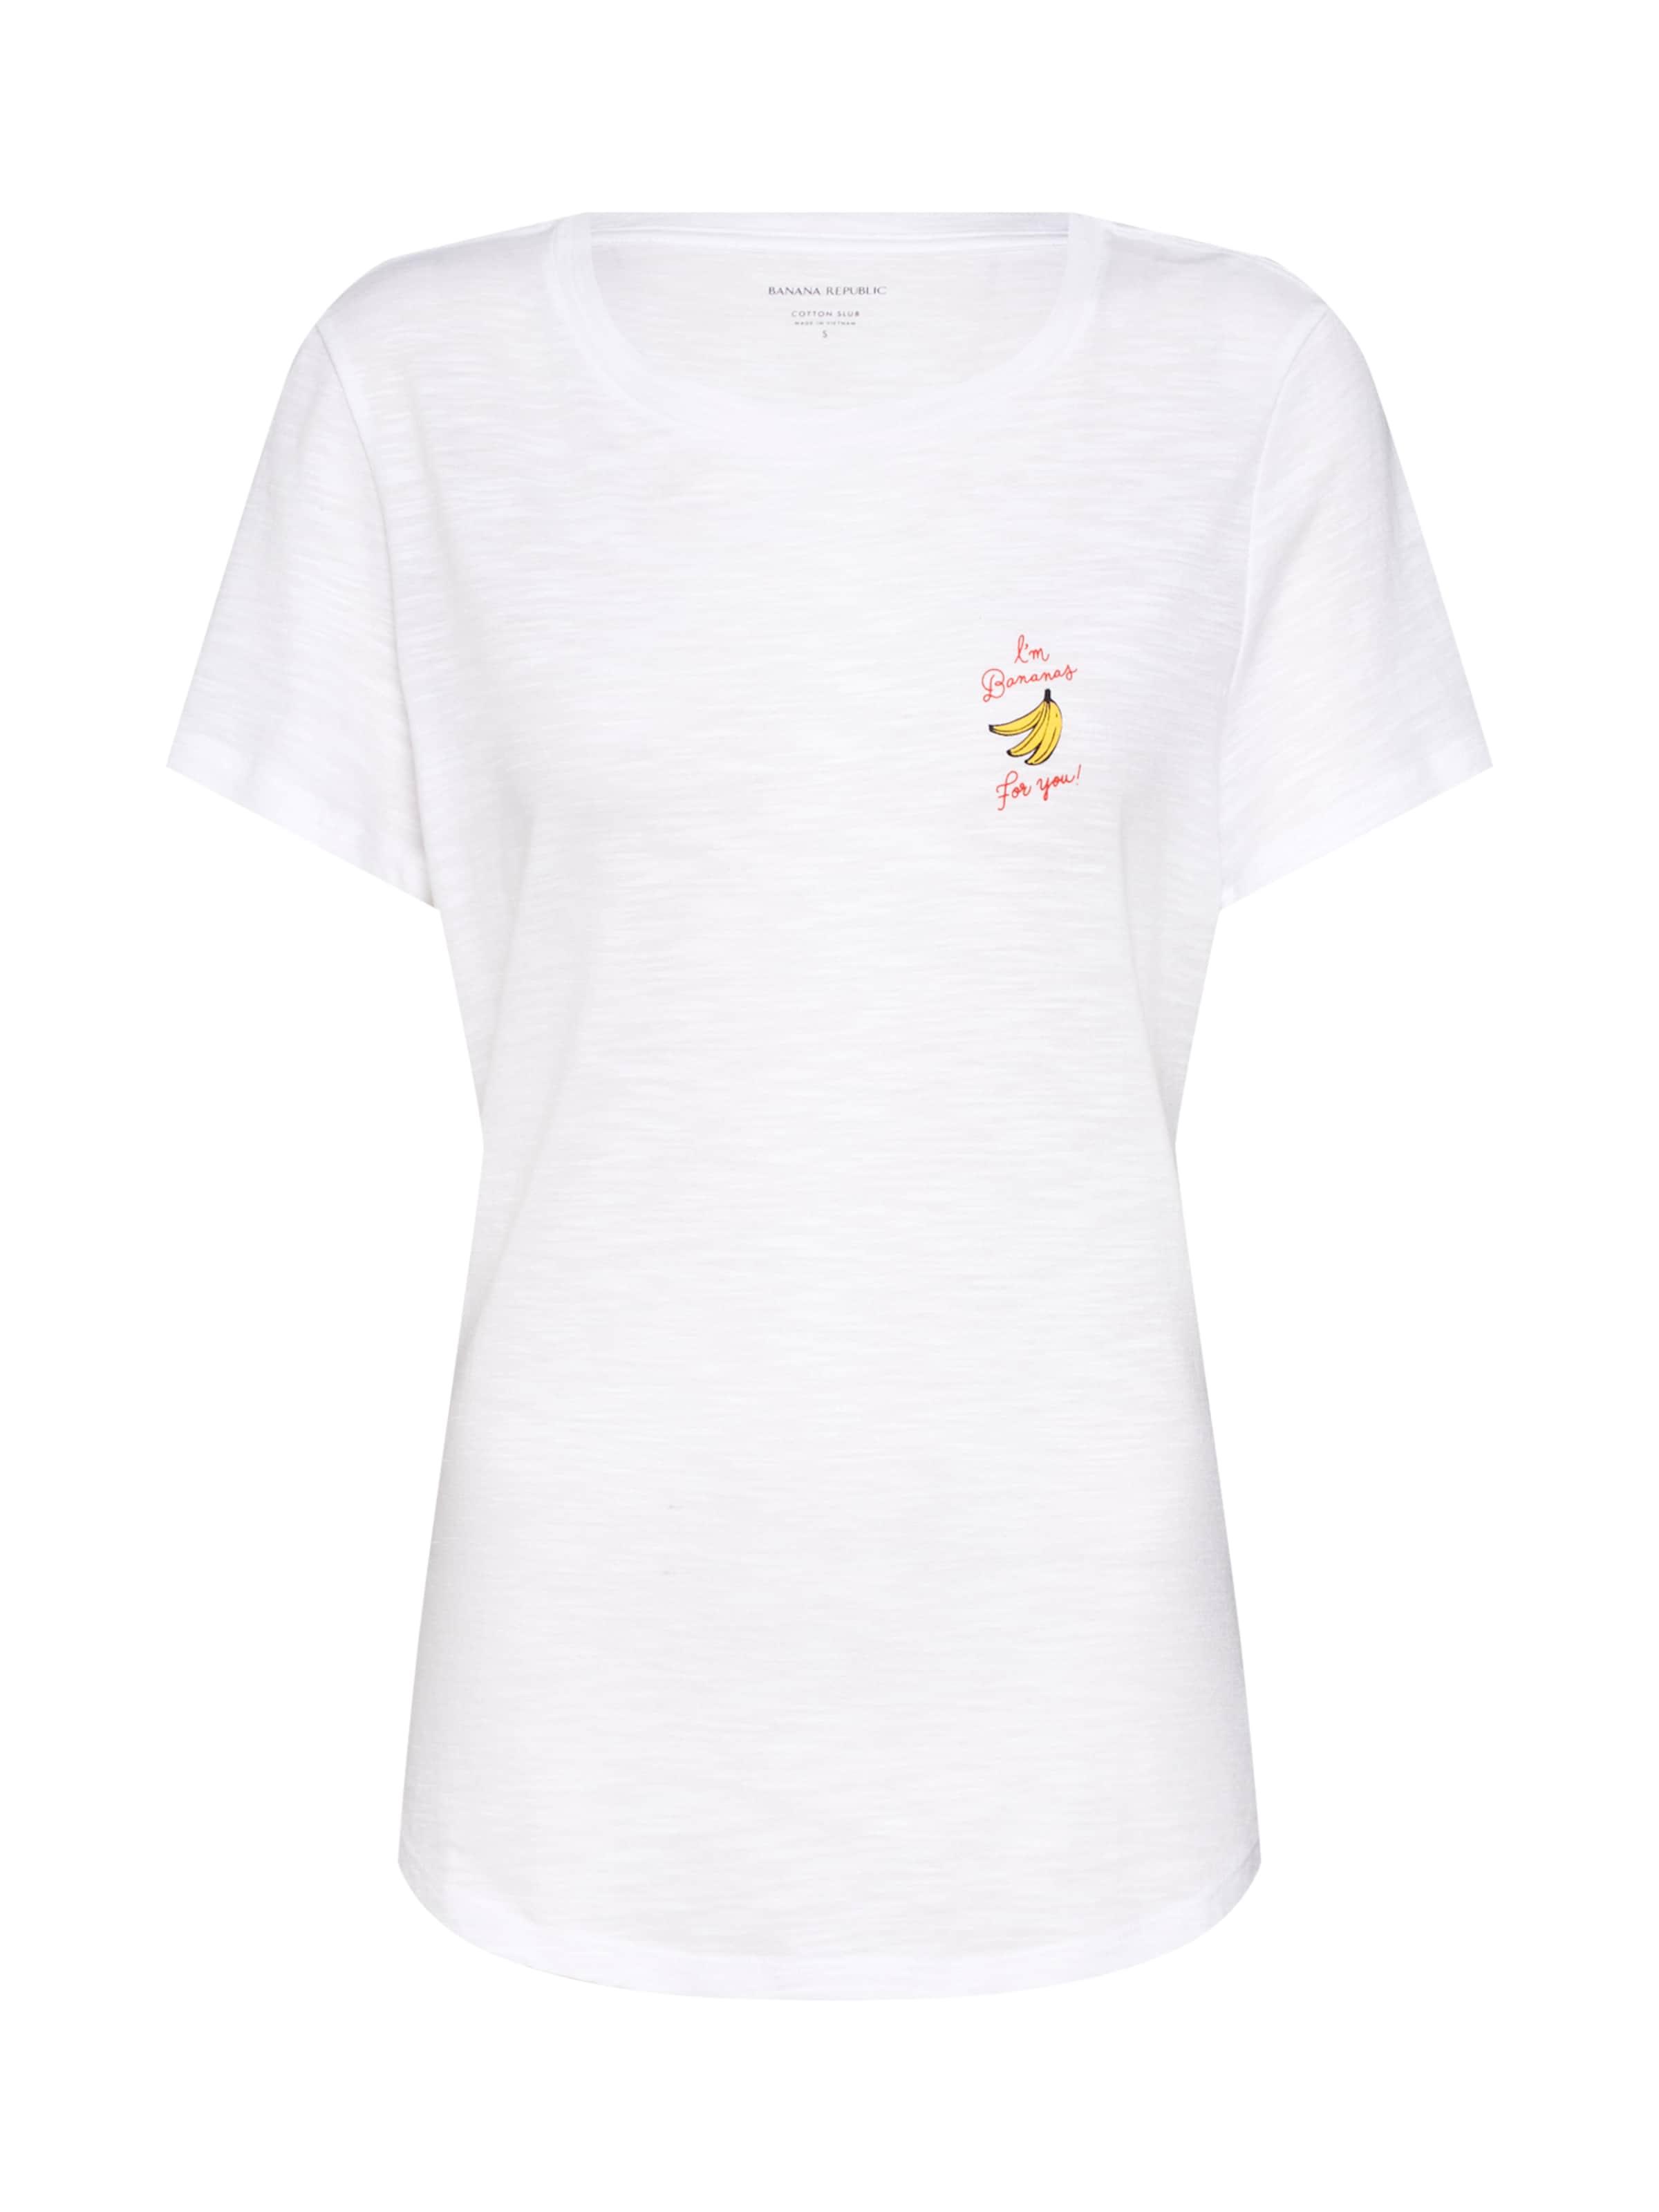 shirt Cotton Bananas Banana Blanc En Republic You' 'ss Crew T For Slub TuPXiOZk